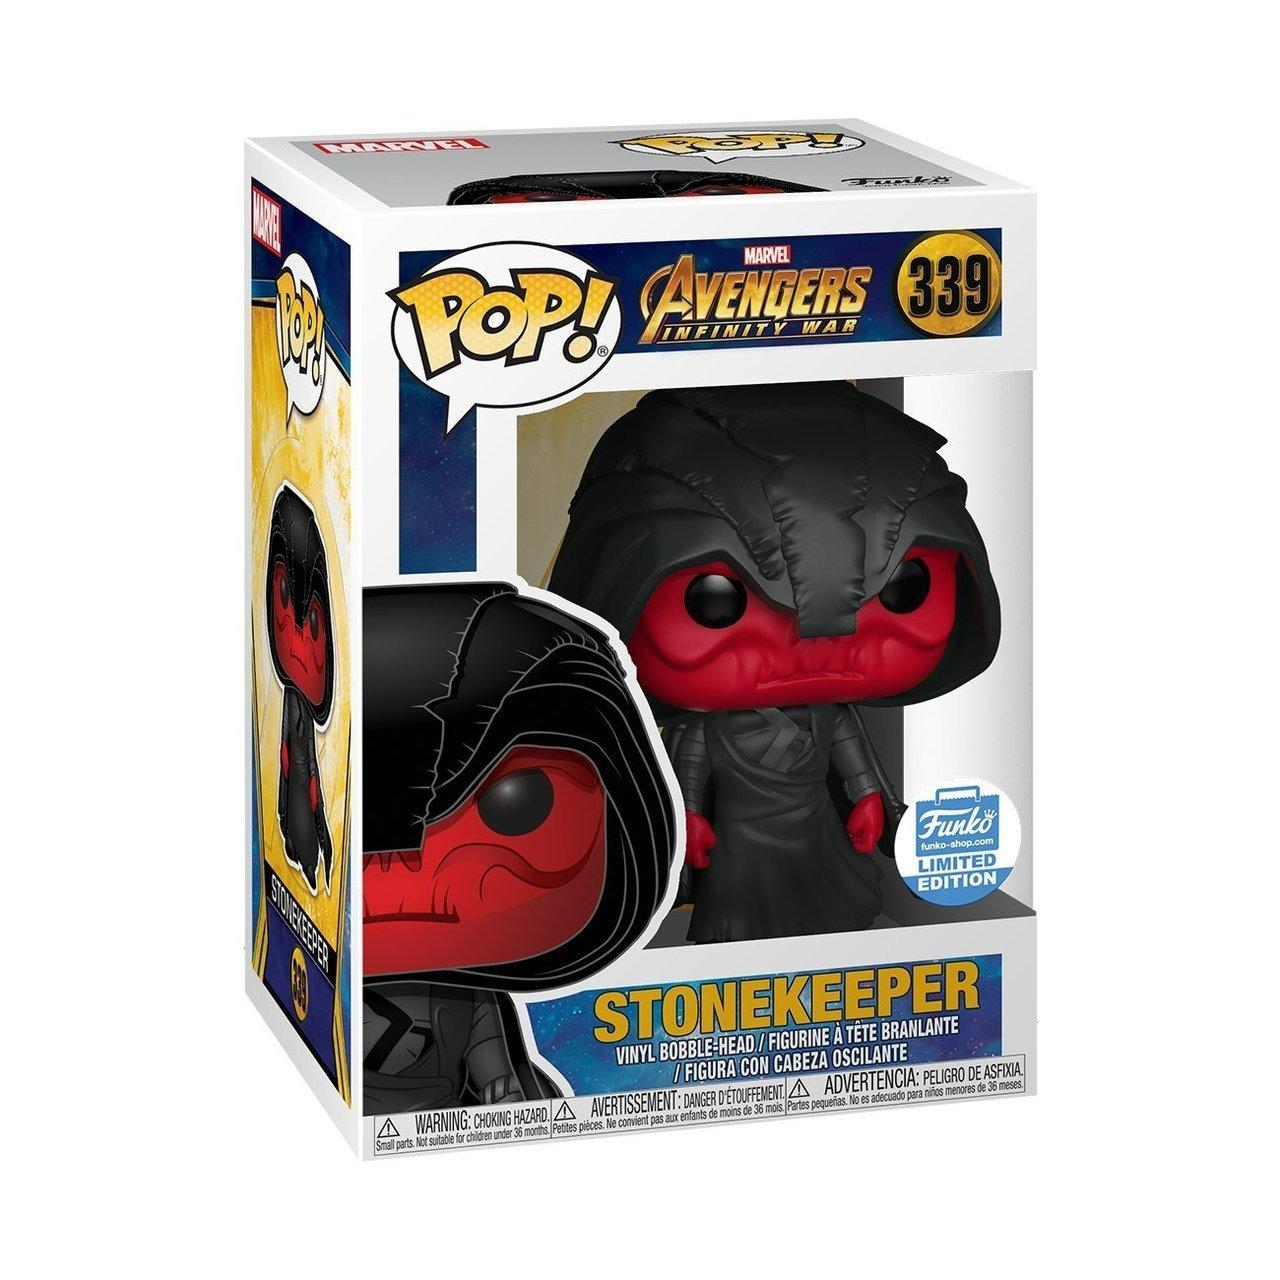 WORST: Stonekeeper Red Skull (339)